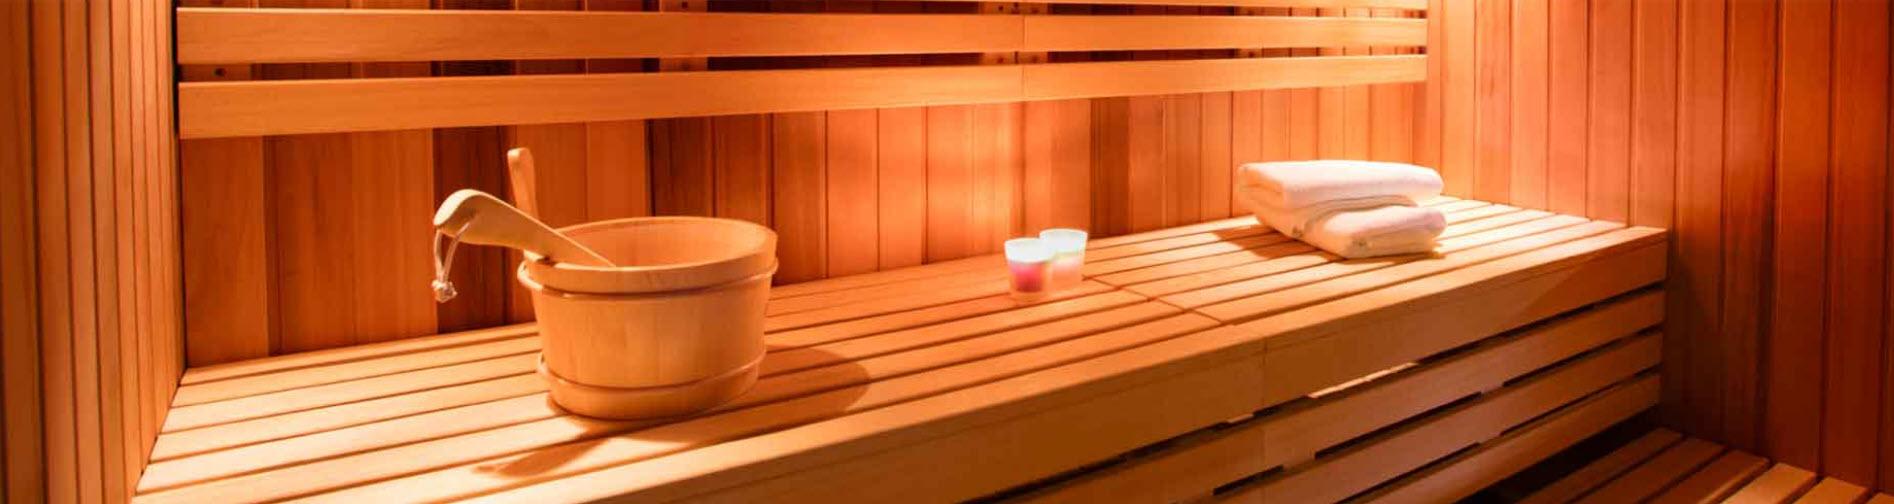 Sauna Use and Acne – What You Should Know, Sauna Sale Saint Paul